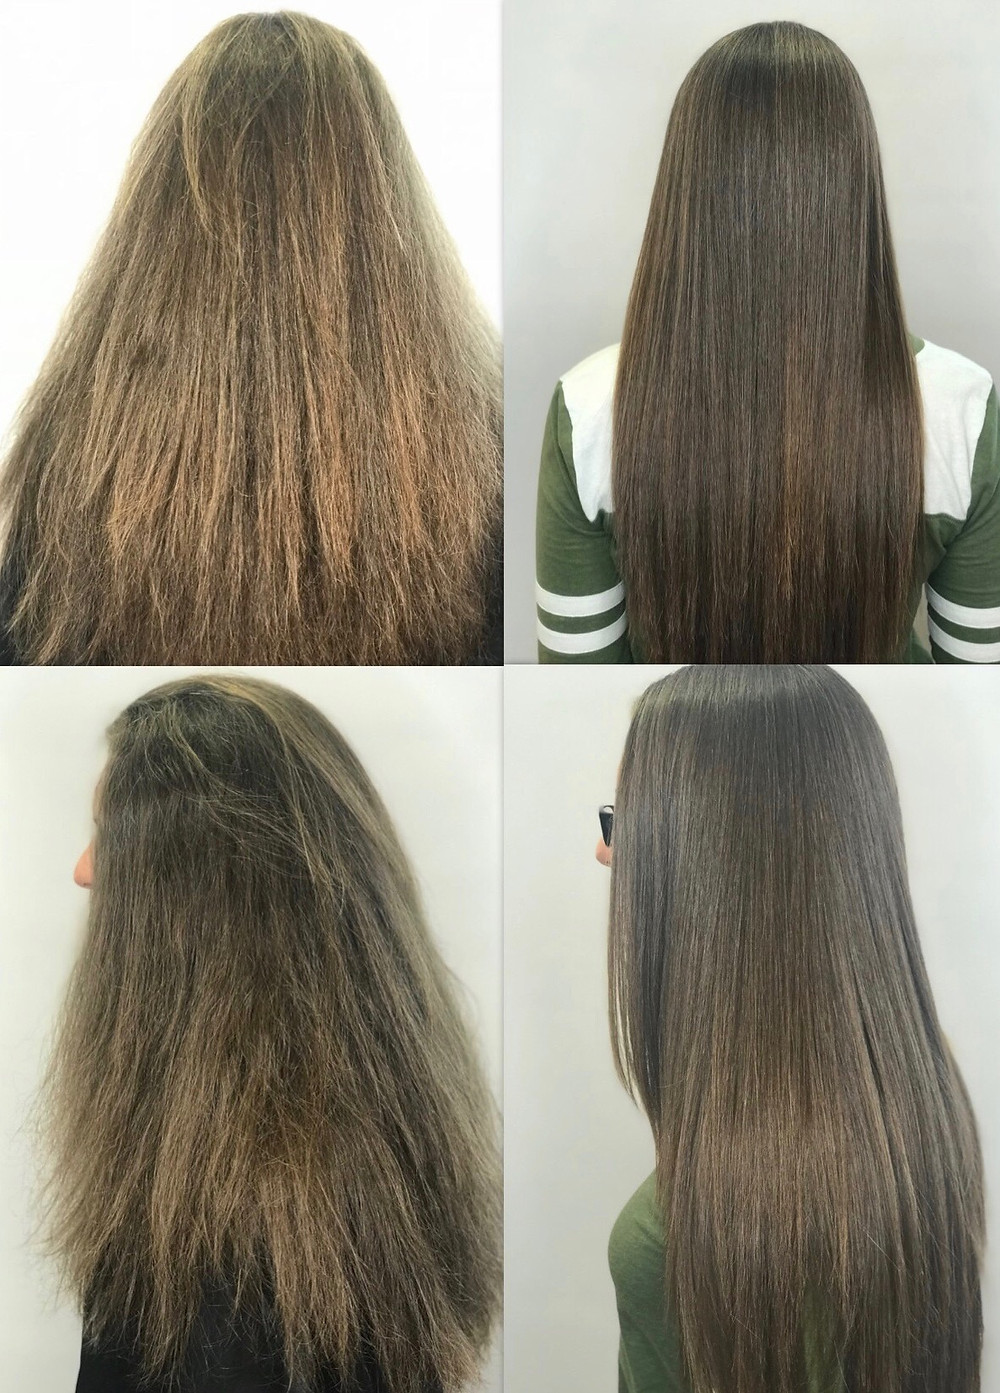 hair straightening services, rusk anti-curl, bio ionic retex, that look salon, east lyme salon, ct hair salon